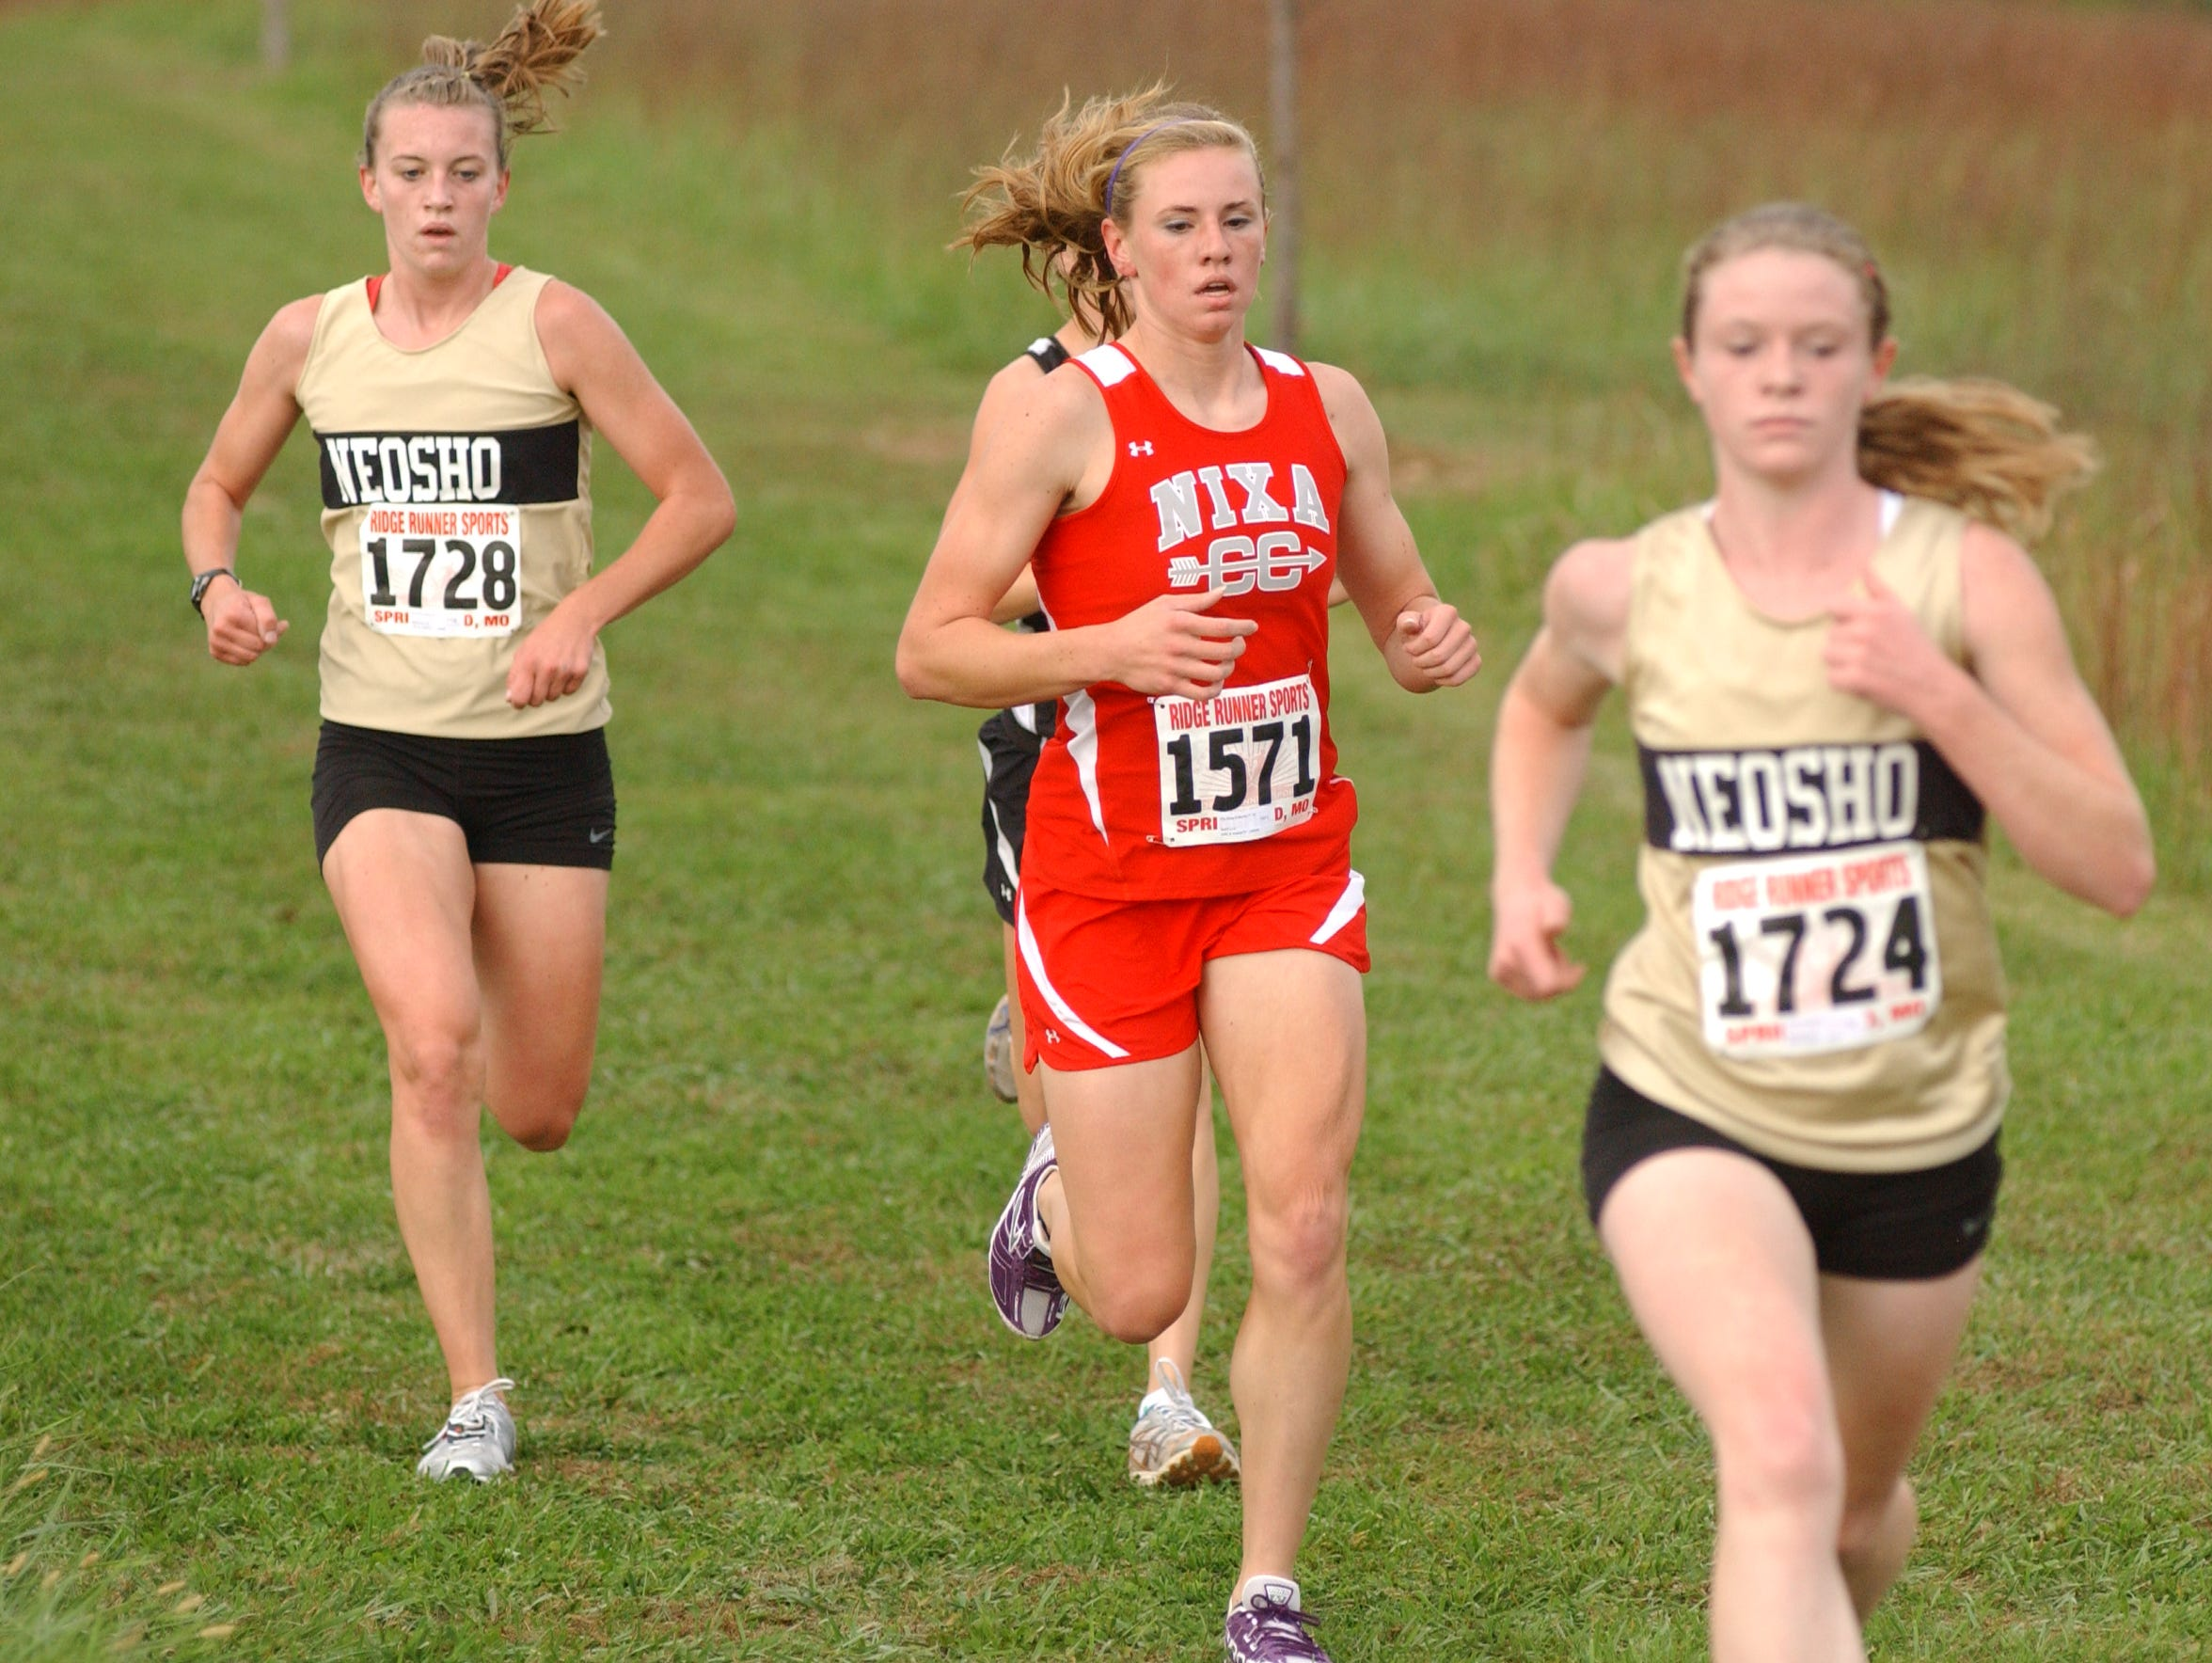 Courtney Frerichs still holds three school records